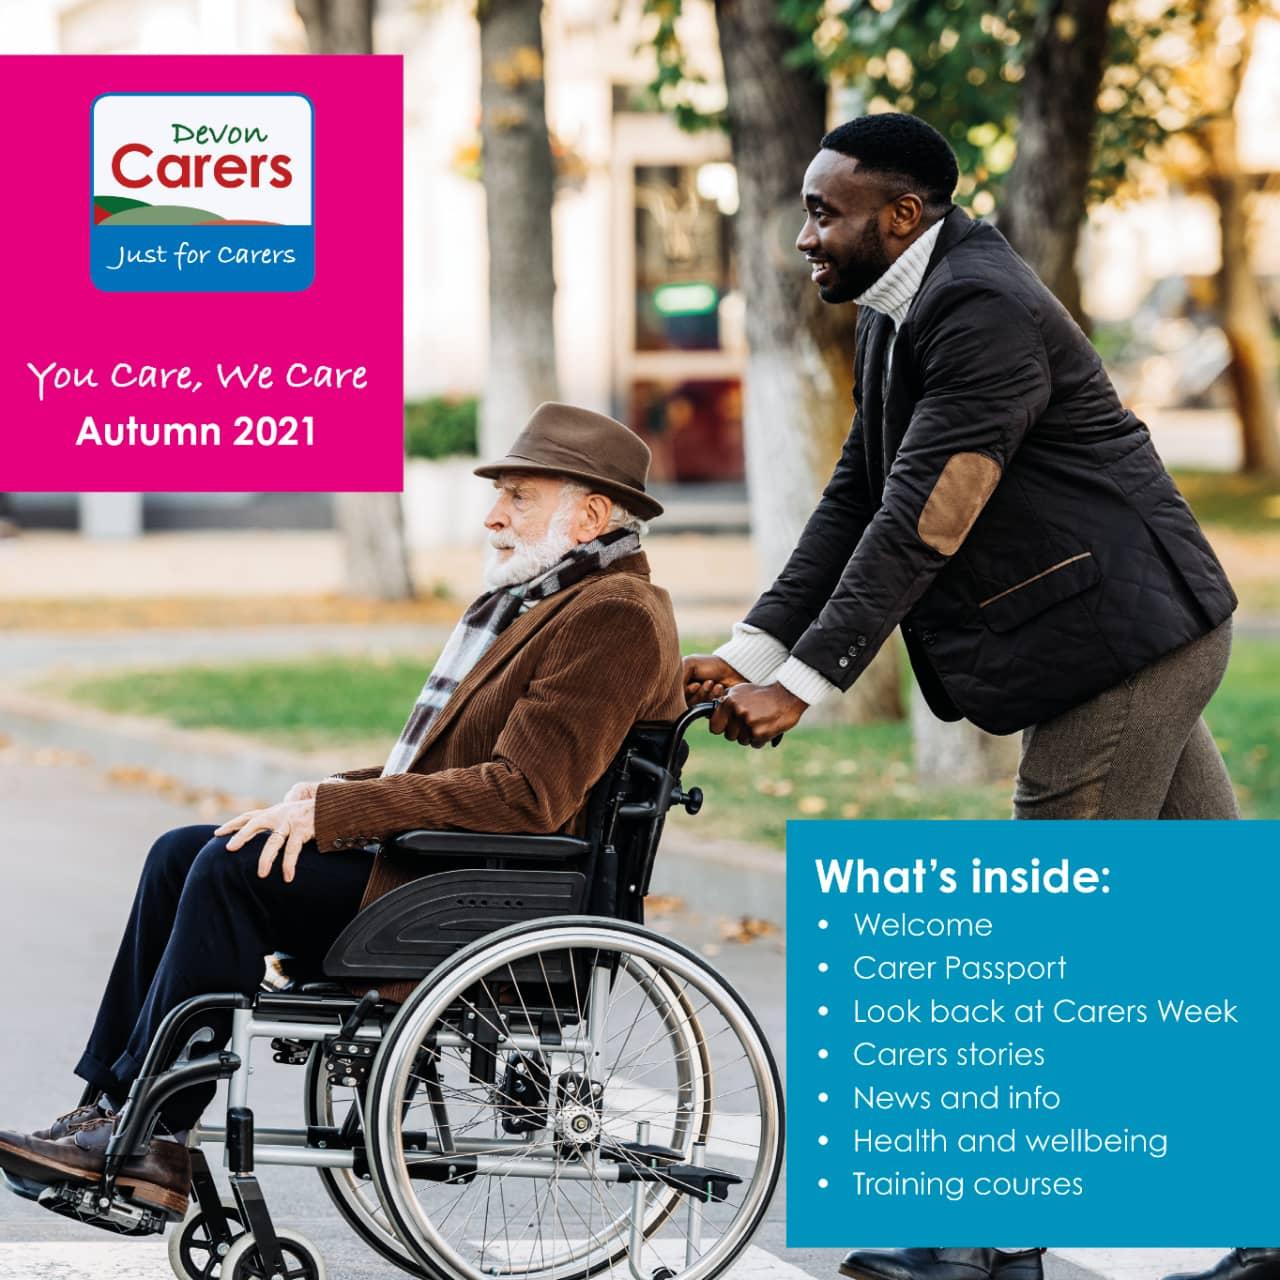 Devon Carers Autumn 2021 Cover